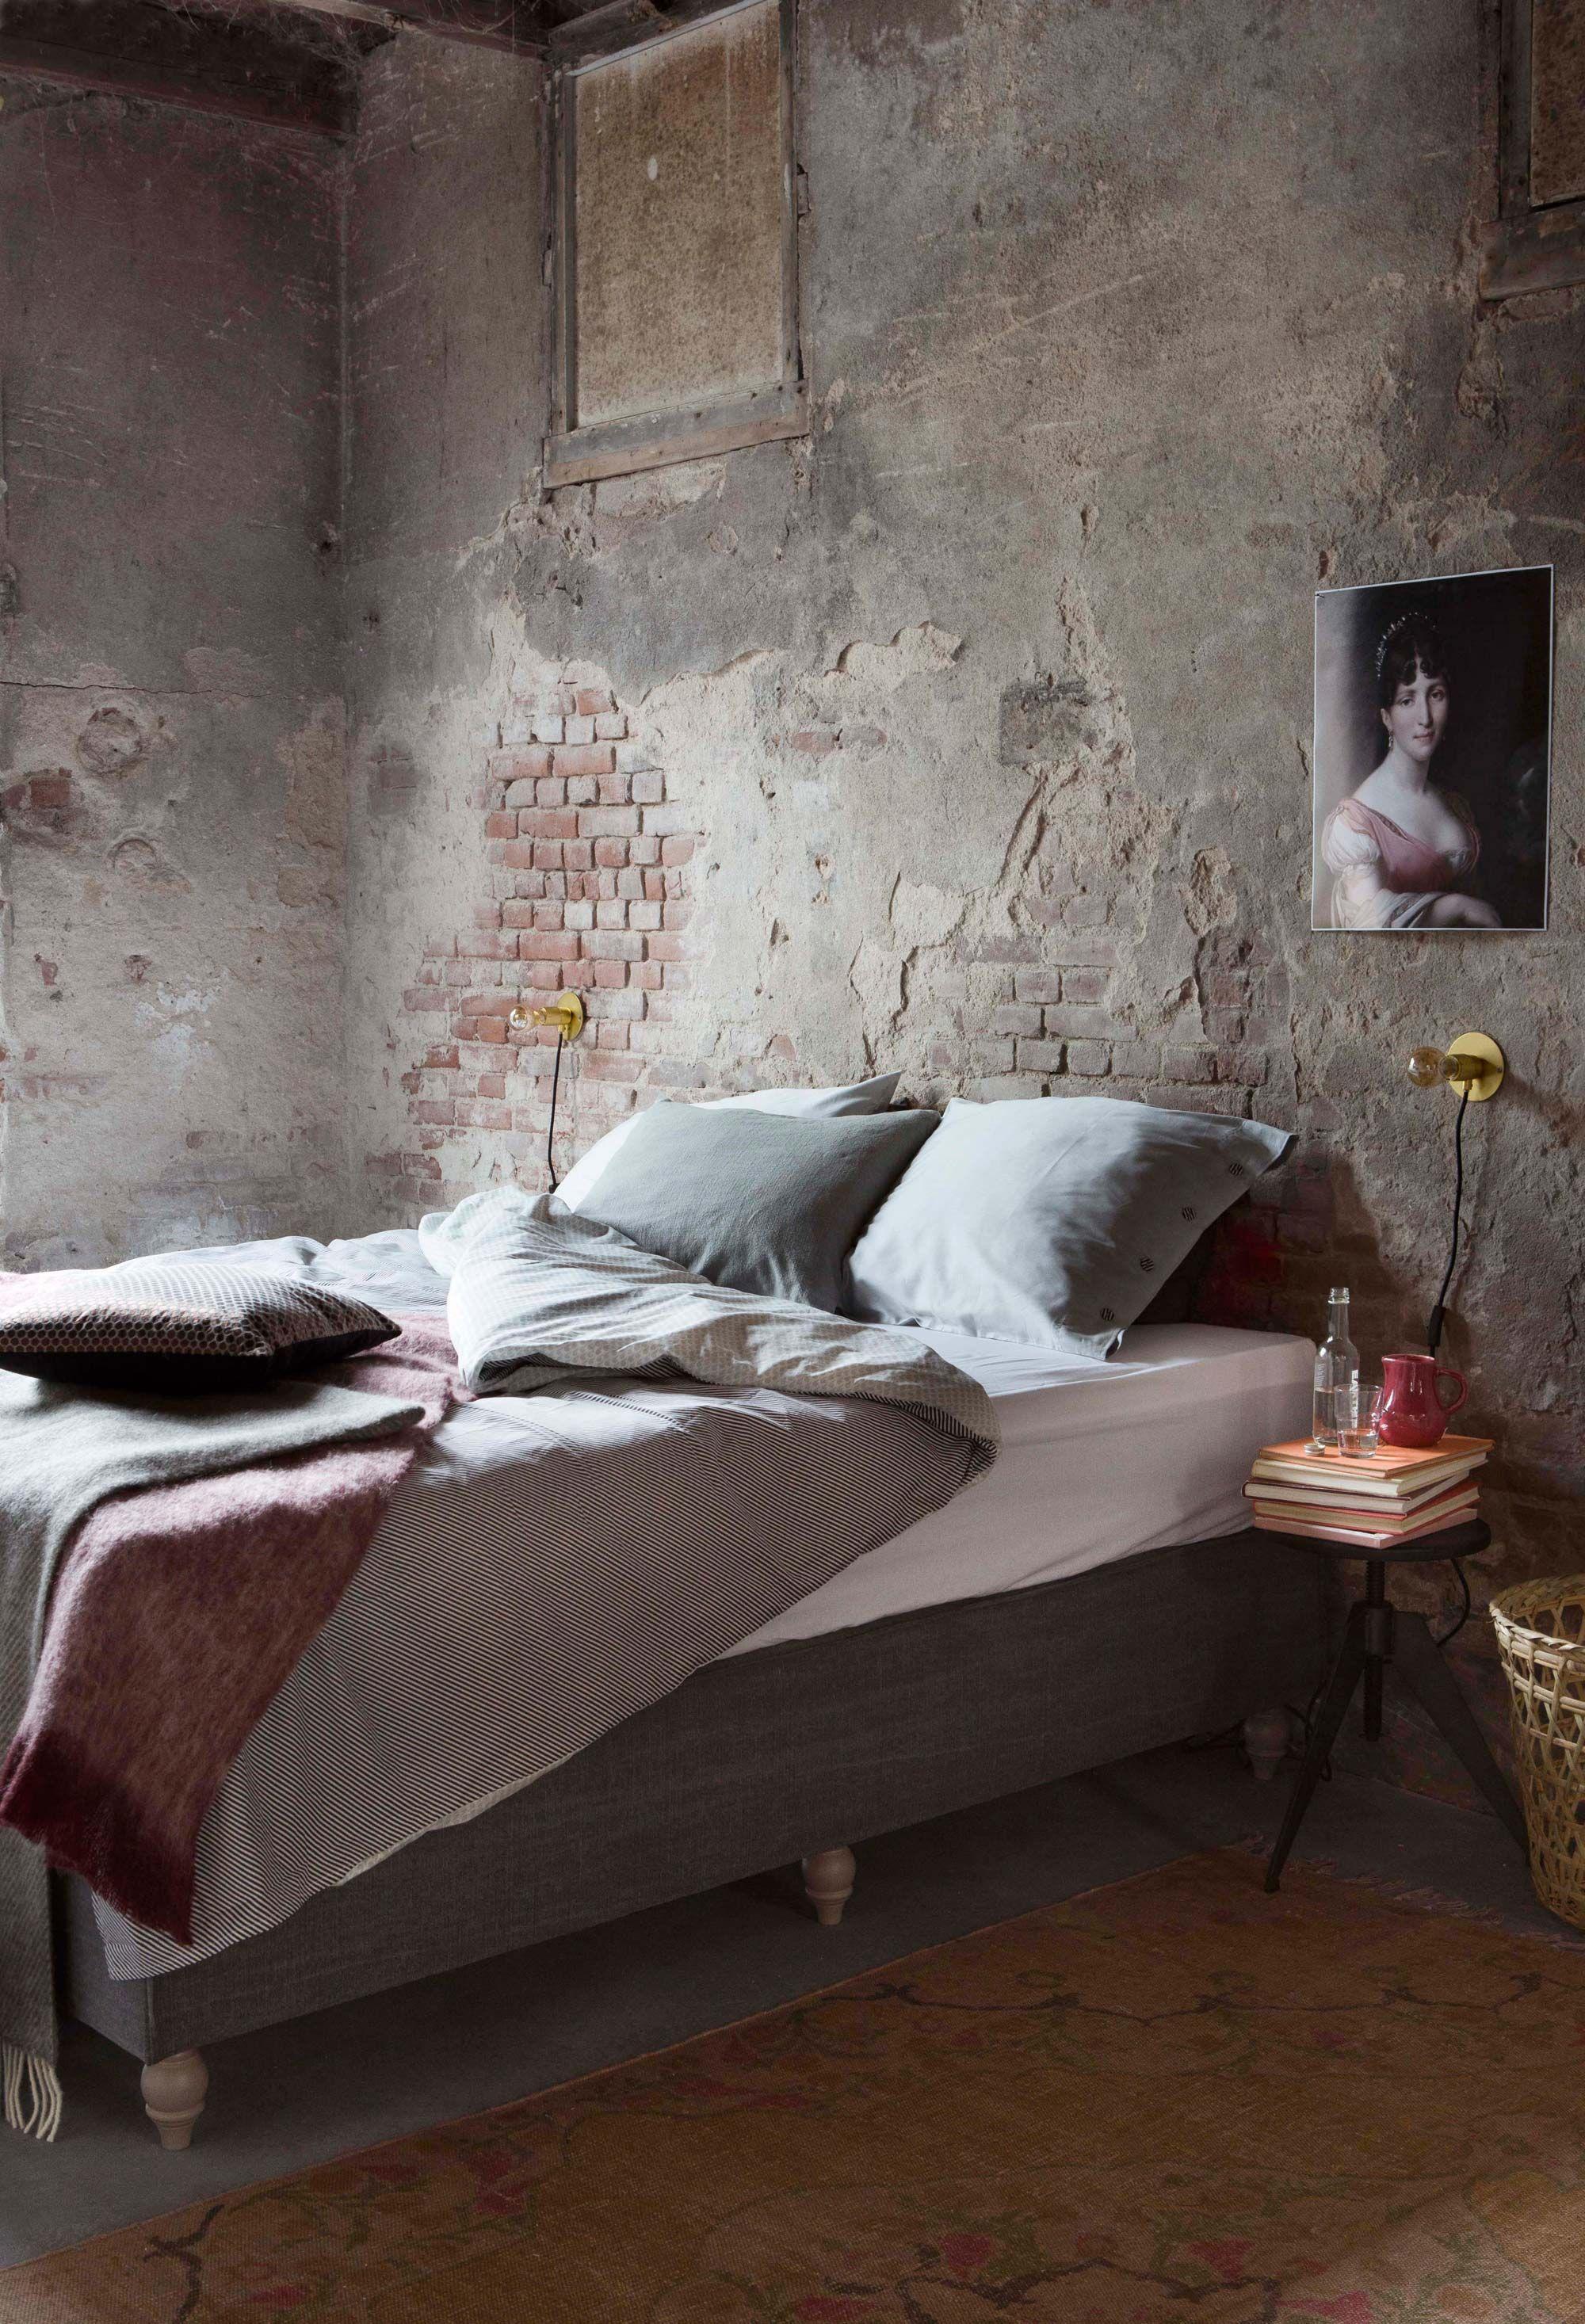 donkere industrile slaapkamer met kussens en plaids dark industrial bedroom with pillows and plaids